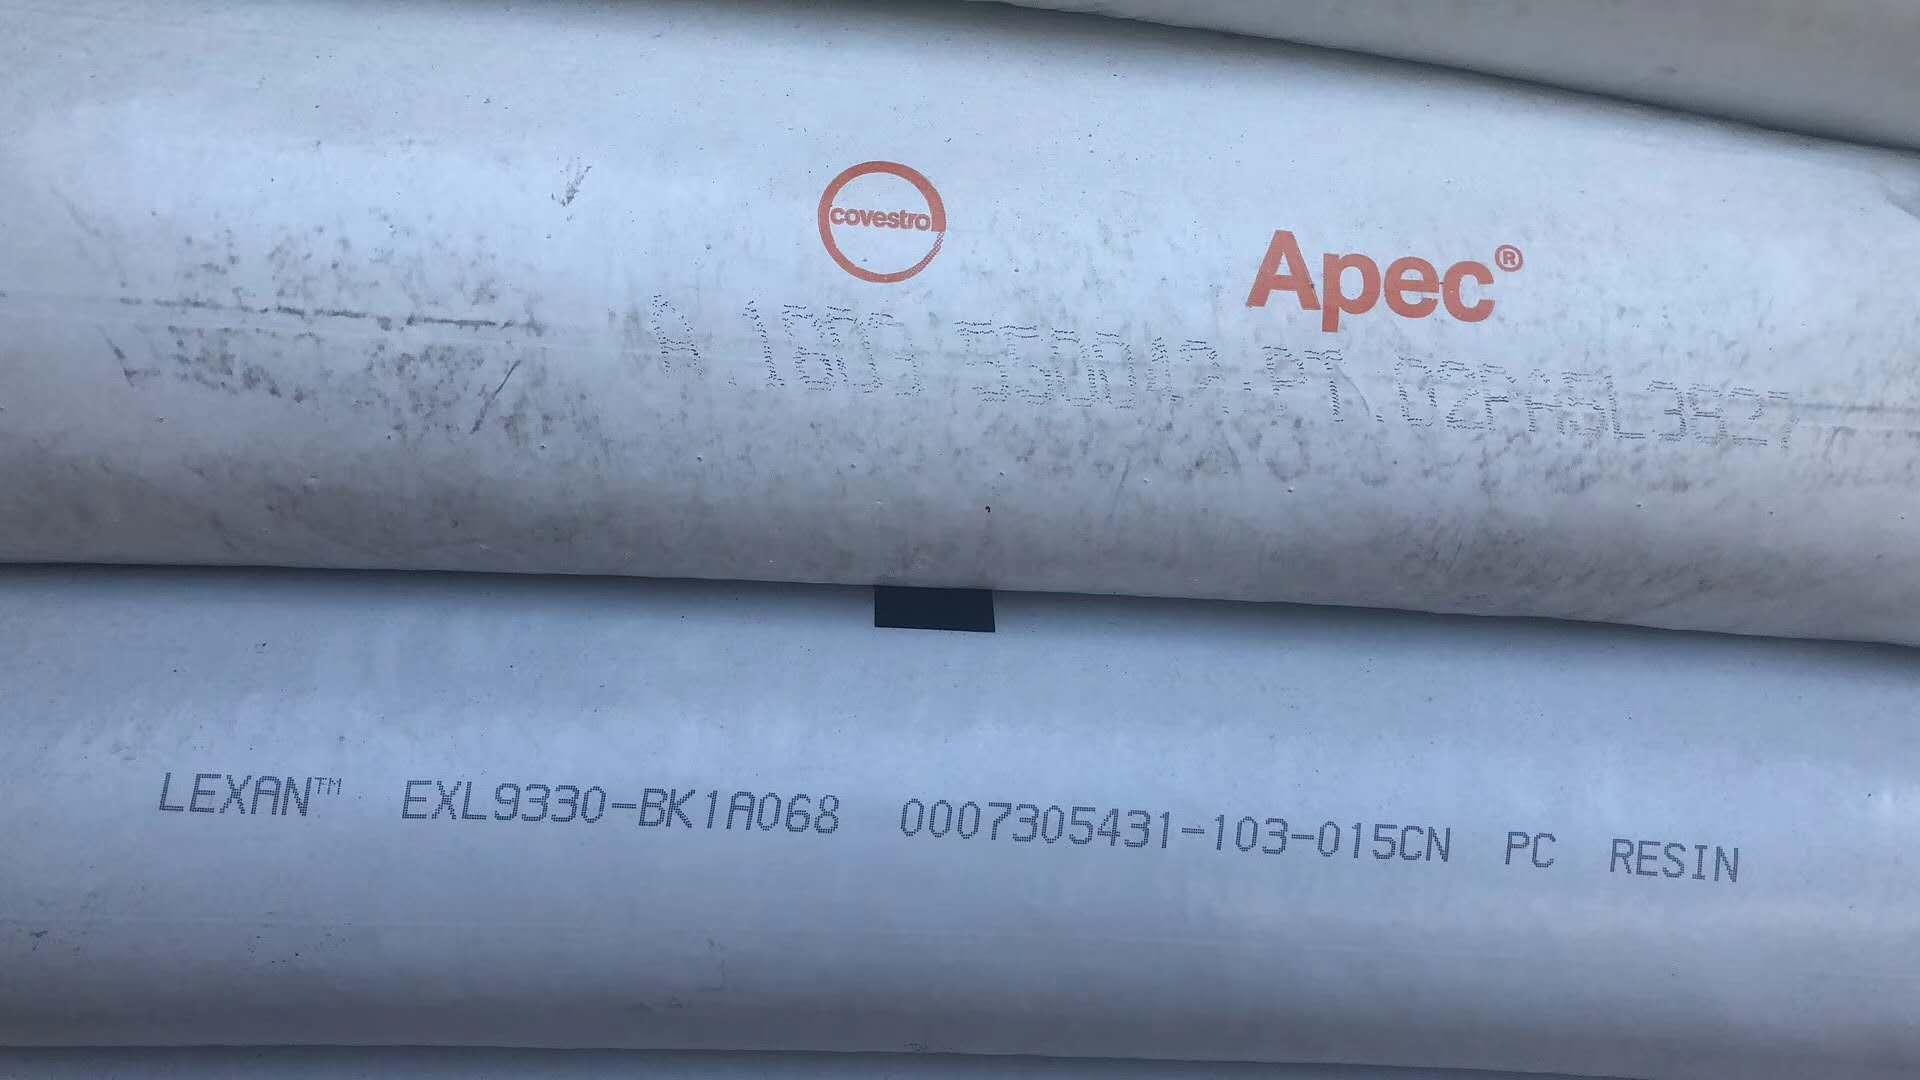 PC-HT APEC 1803